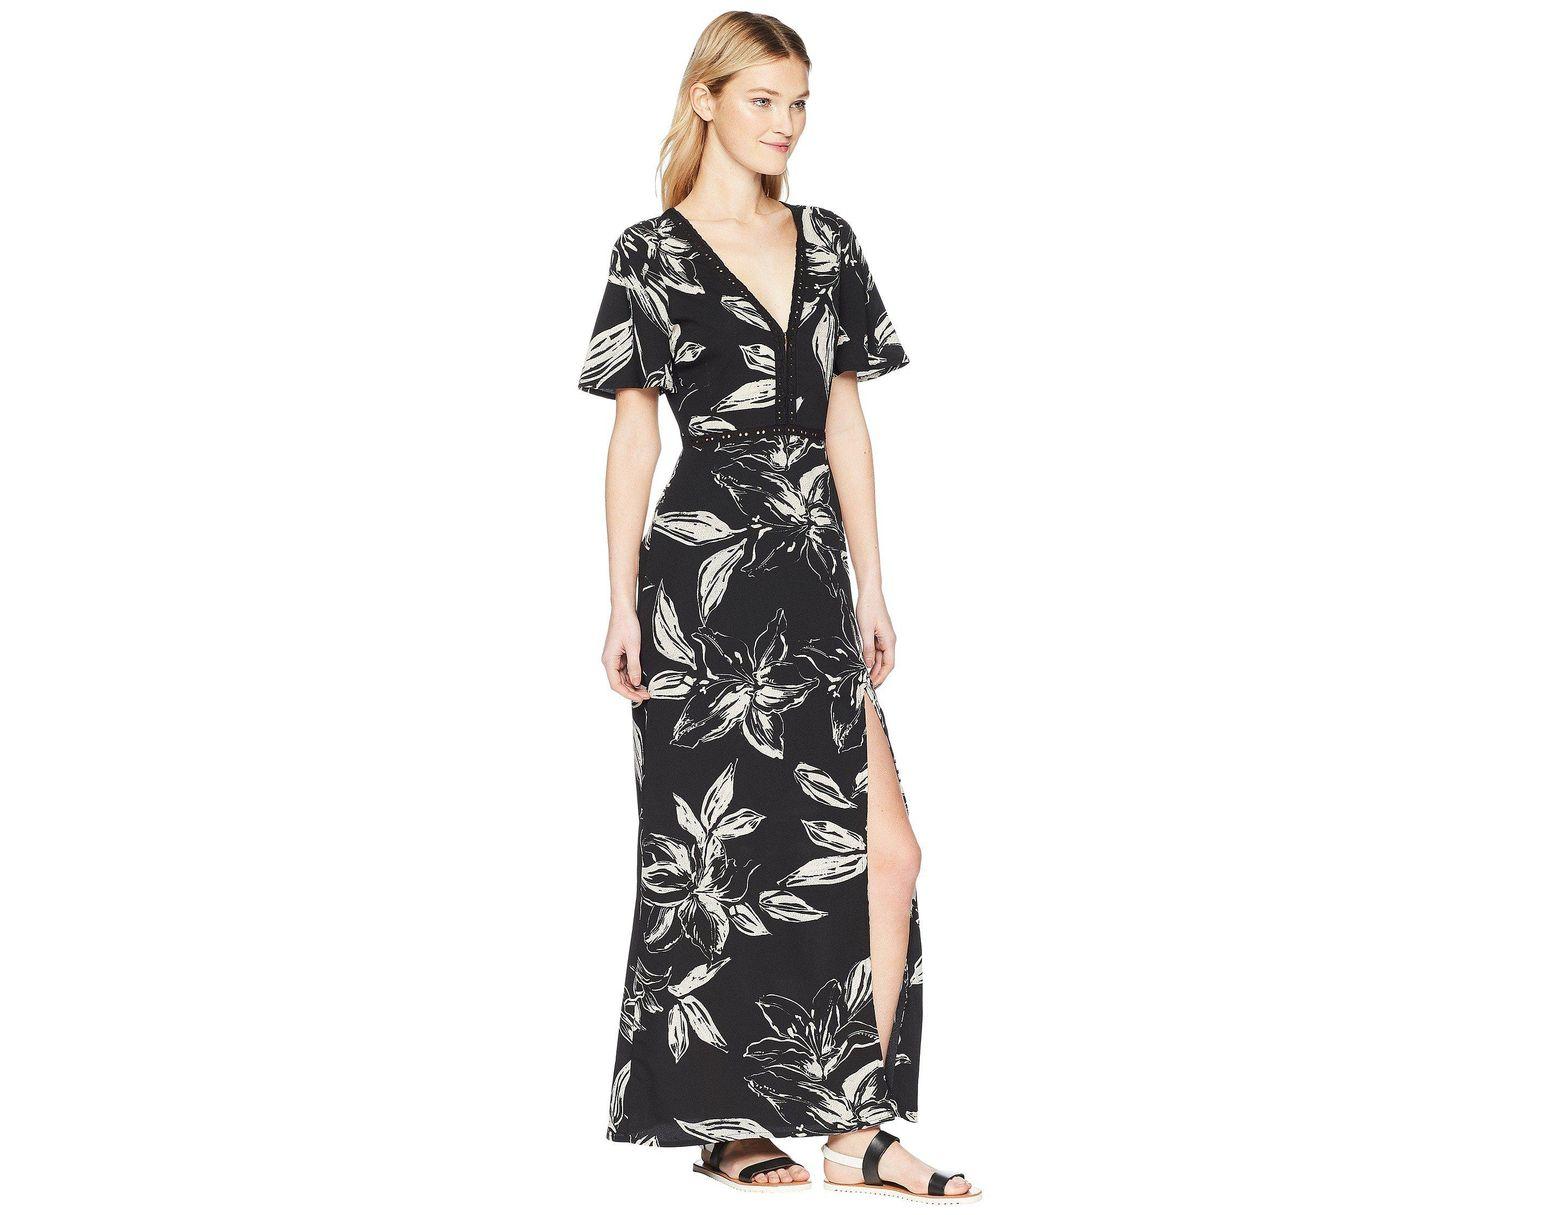 efbc2ce4ed2670 Amuse Society Seaside Dress in Black - Save 54% - Lyst